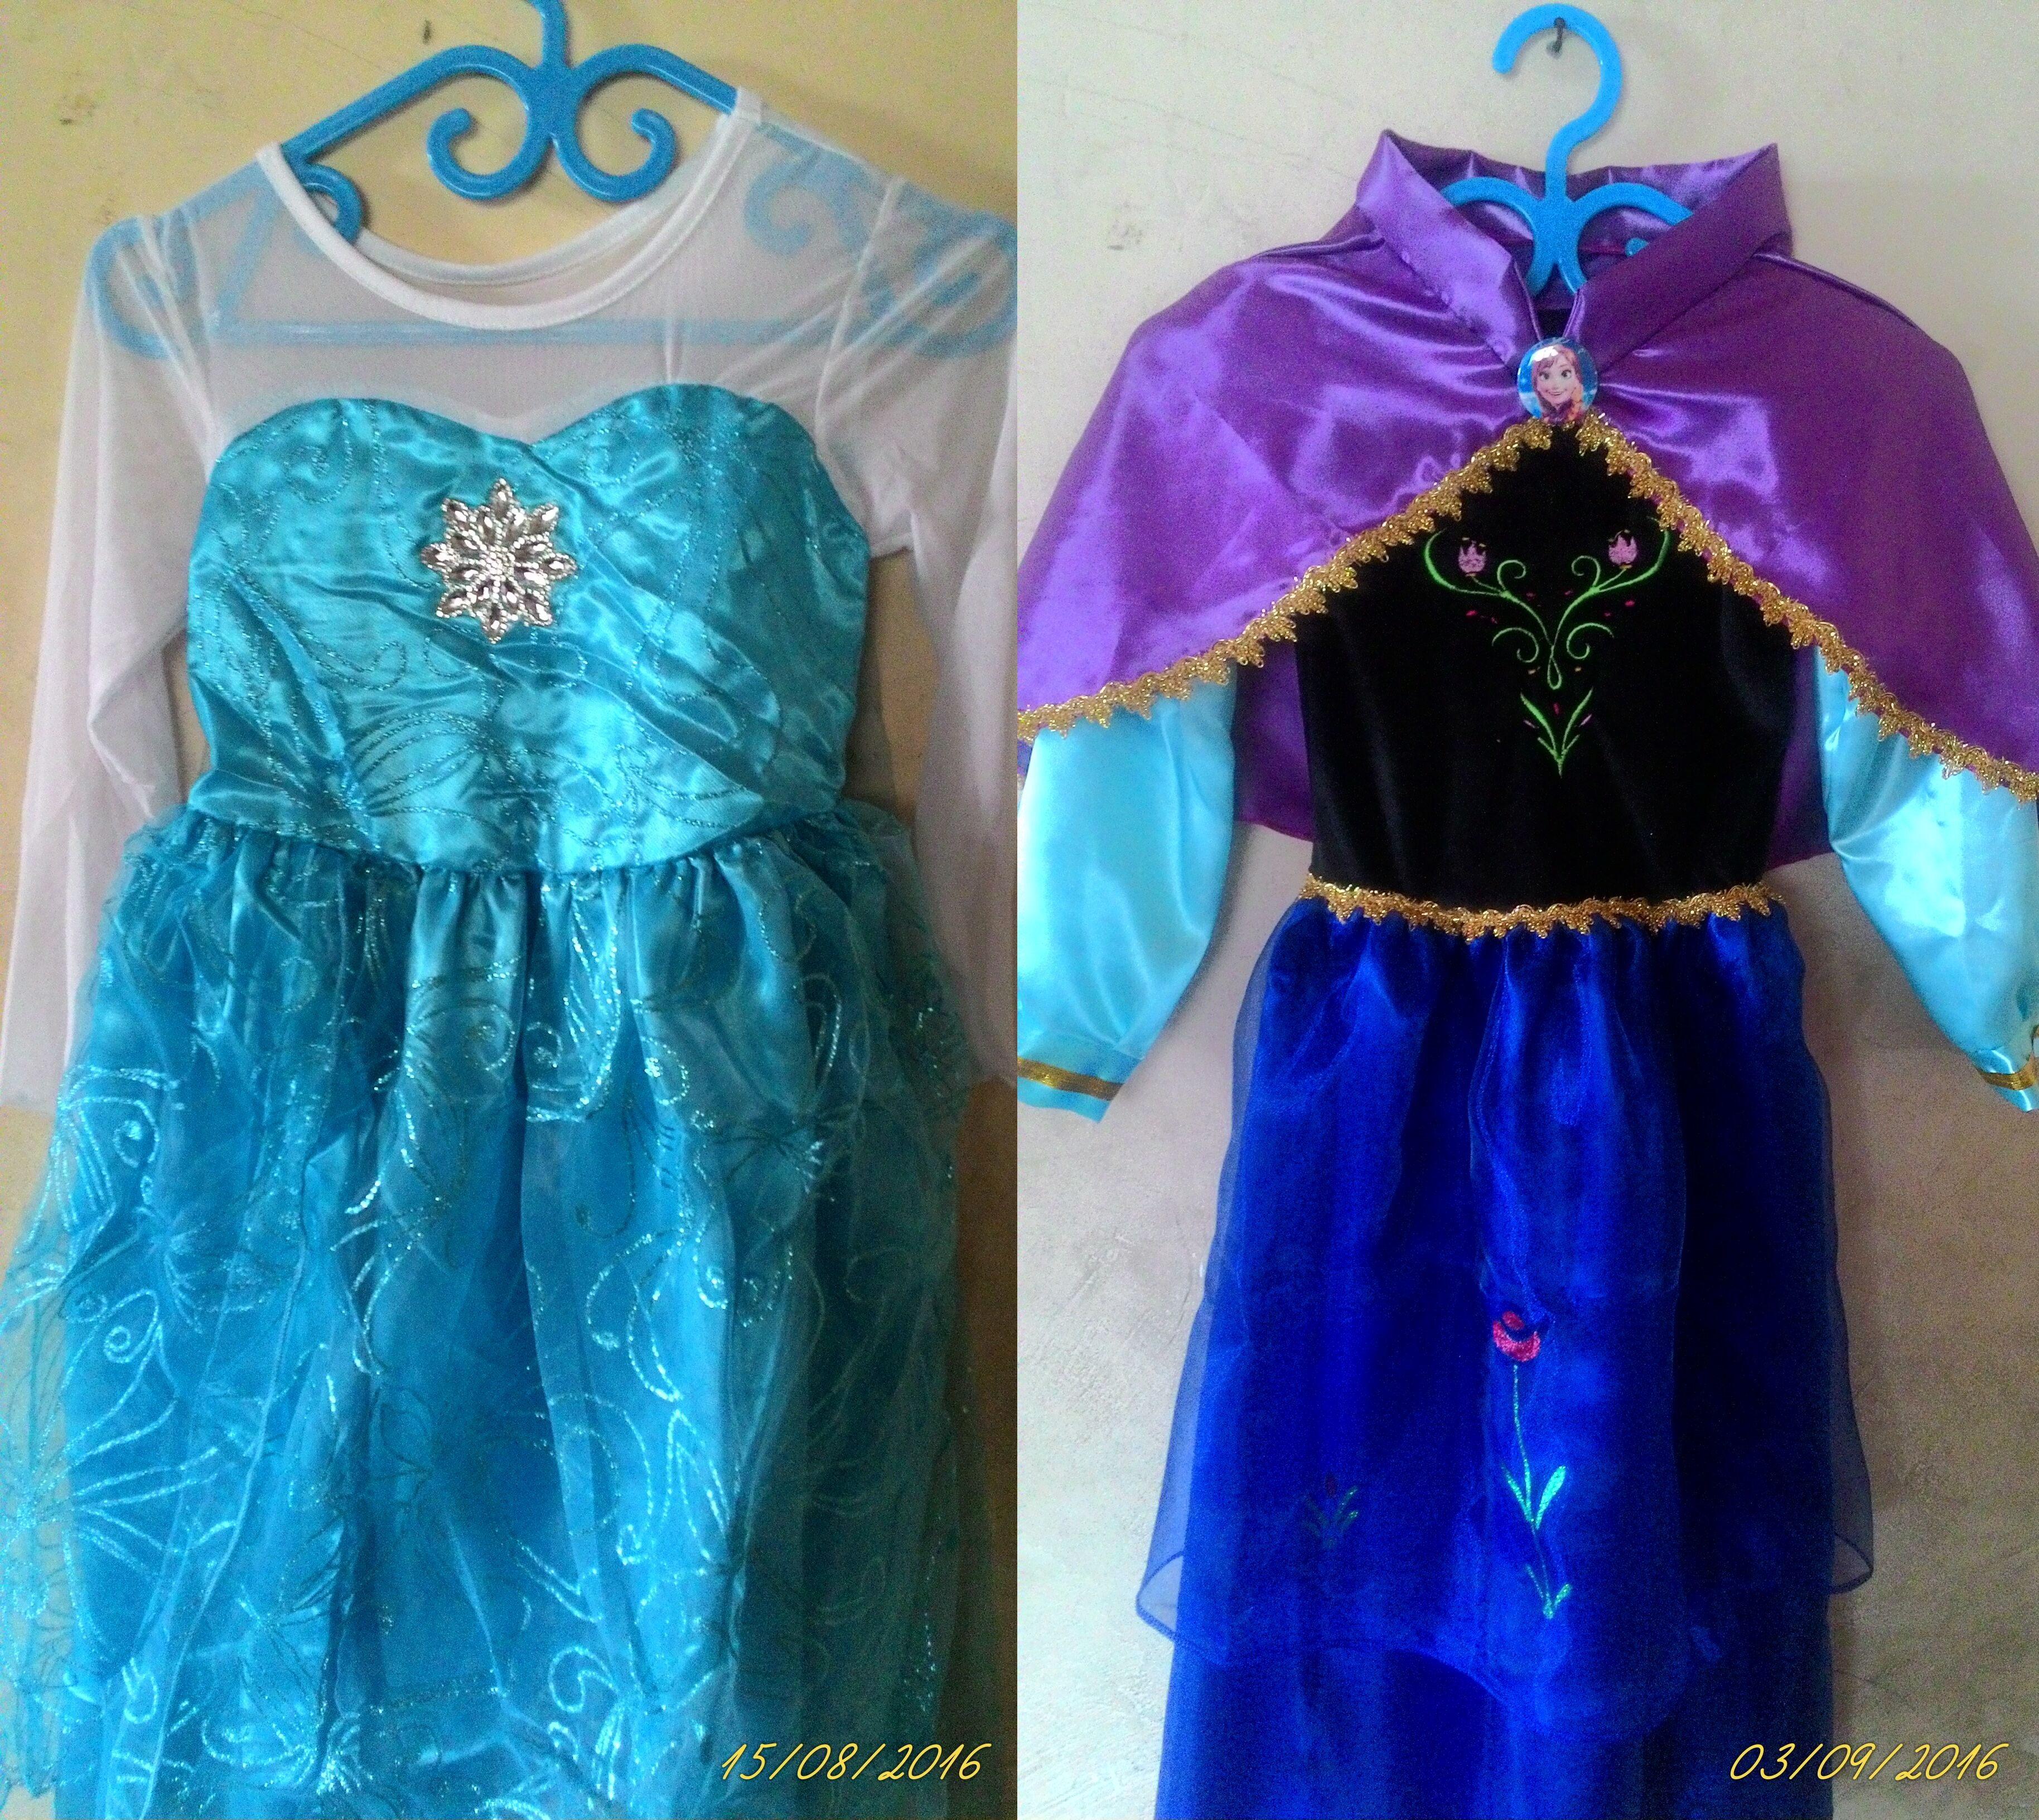 Fantasia Vestido Frozen Anna E Elsa